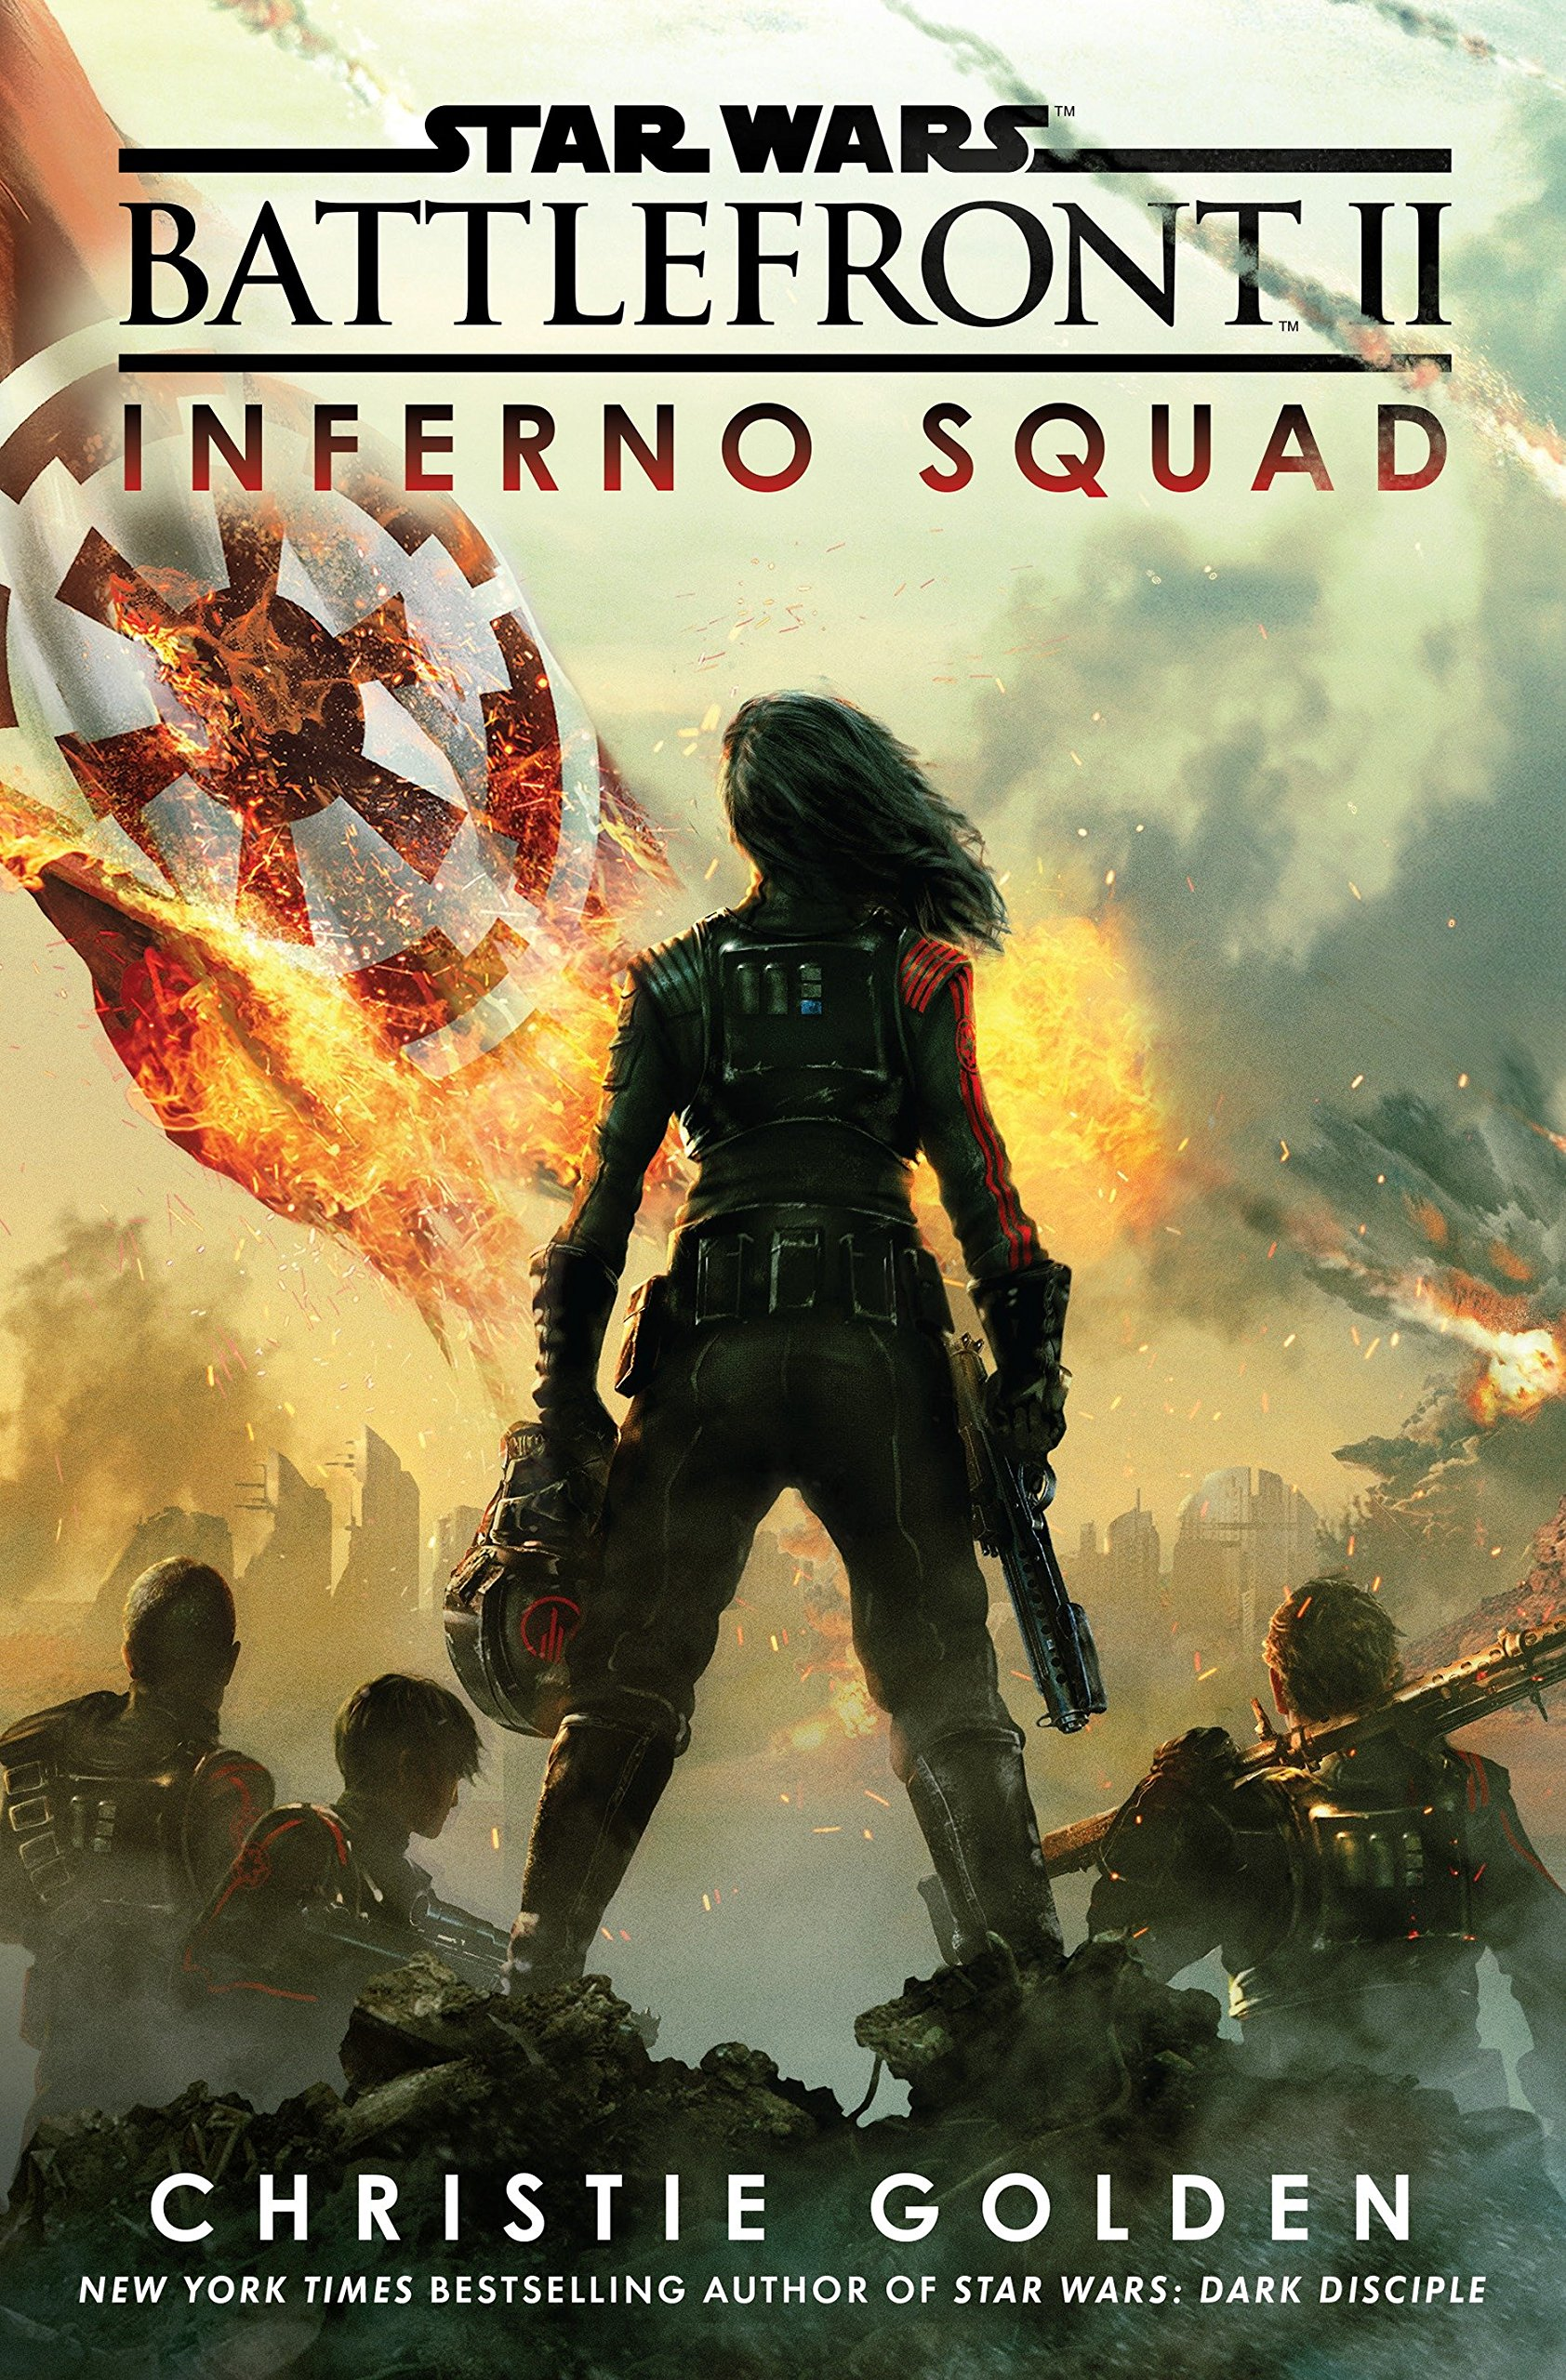 inferno squad battledront ii christie golden